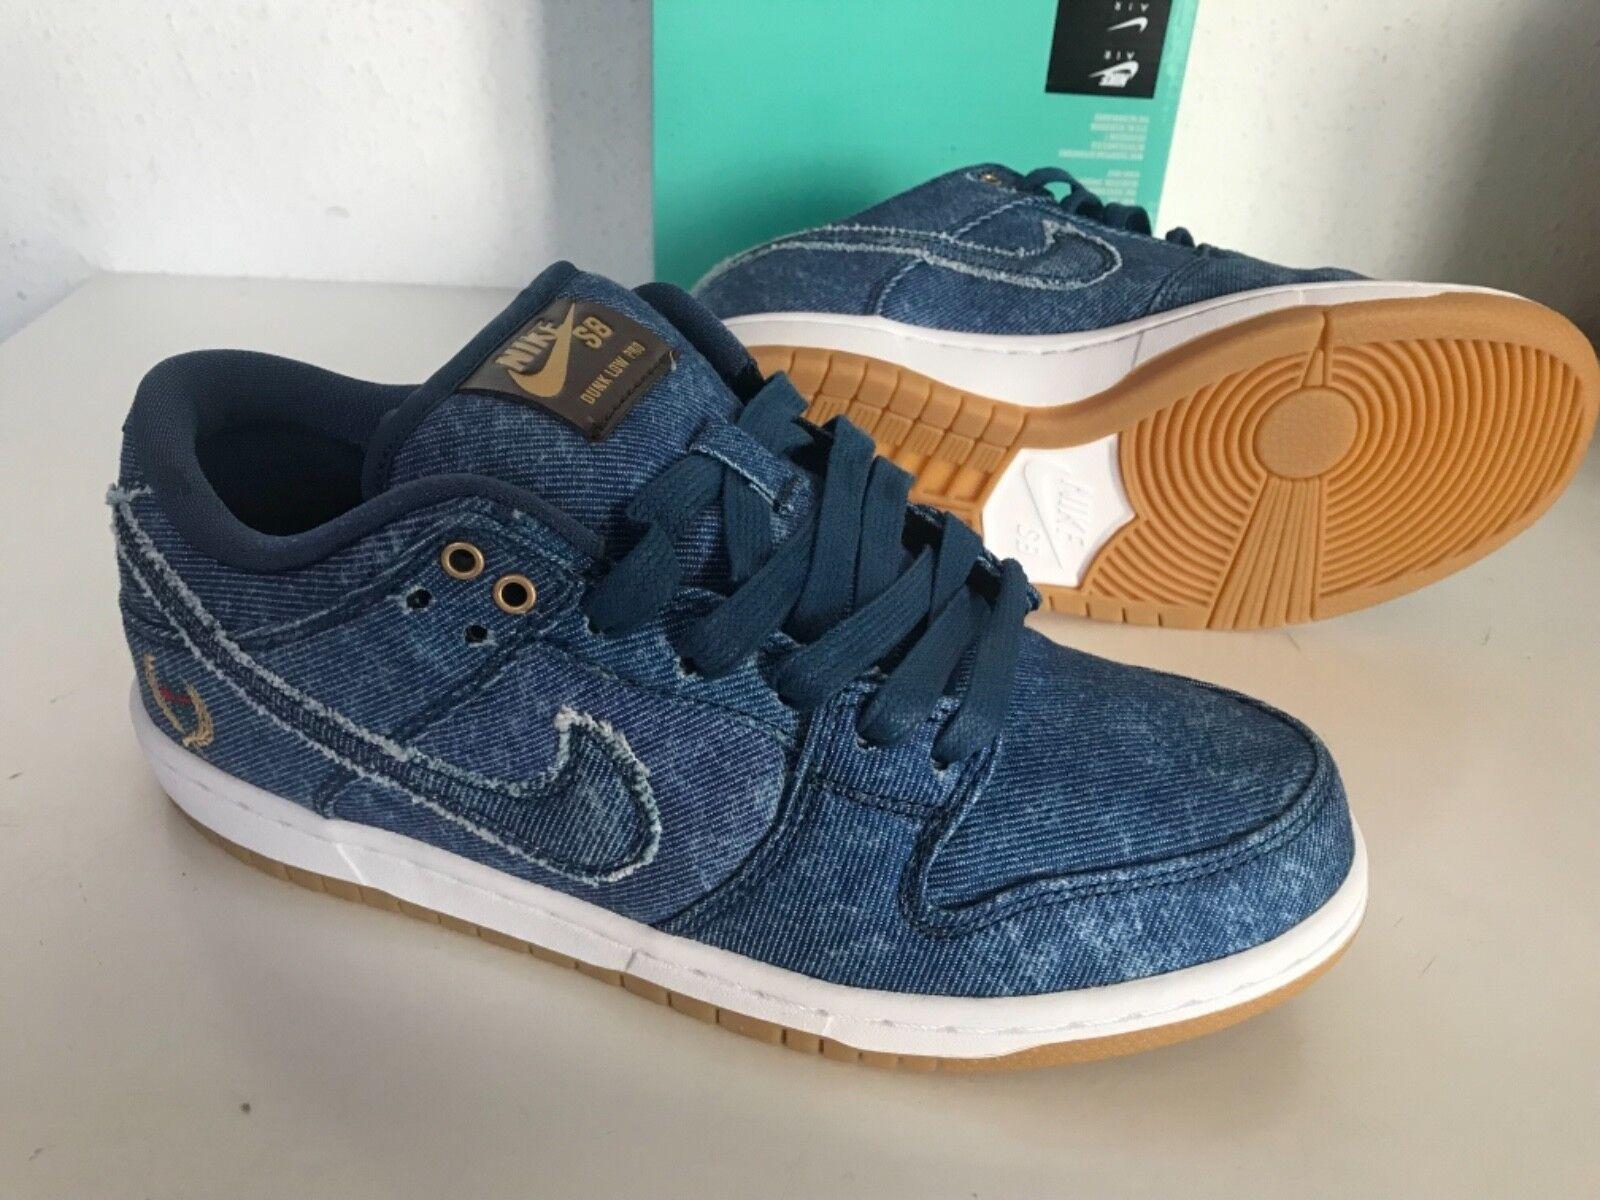 Nike SB Dunk Low TRD QS  East vs West Biggie Tupac  US 5 Men's shoes 883232-441